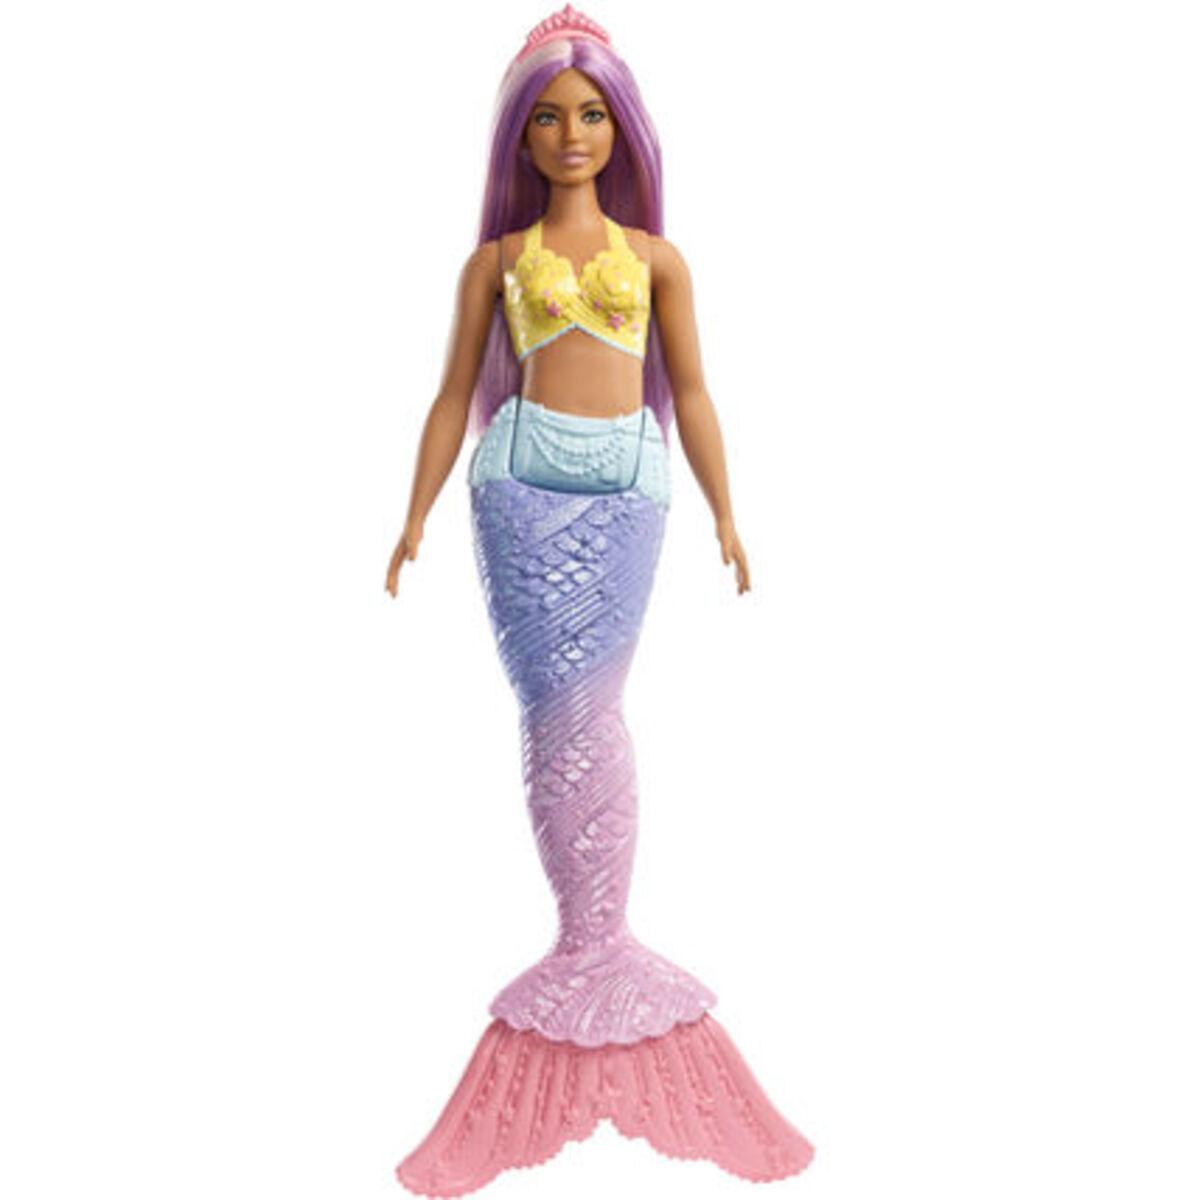 Bild 1 von Barbie Dreamtopia Meerjungfrau, lila Haare